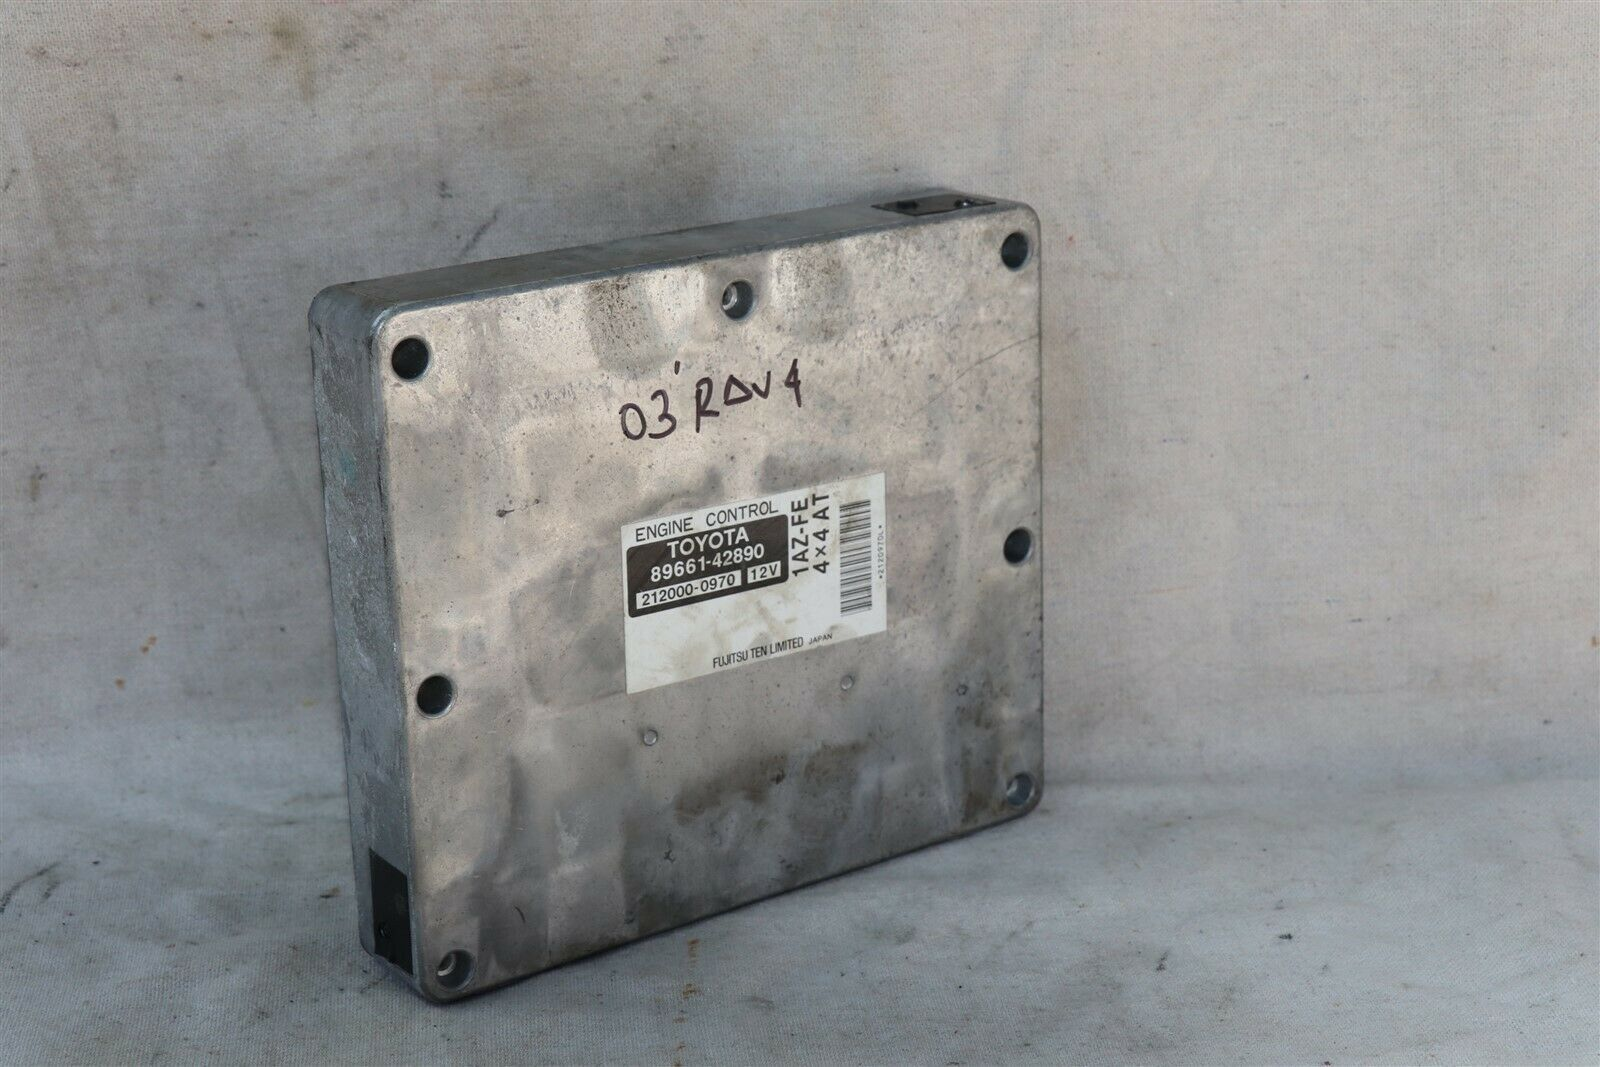 Toyota 1AZ-FE 4x4 A/T ECM ECU Engine Control Module 89661-42890, 212000-0970